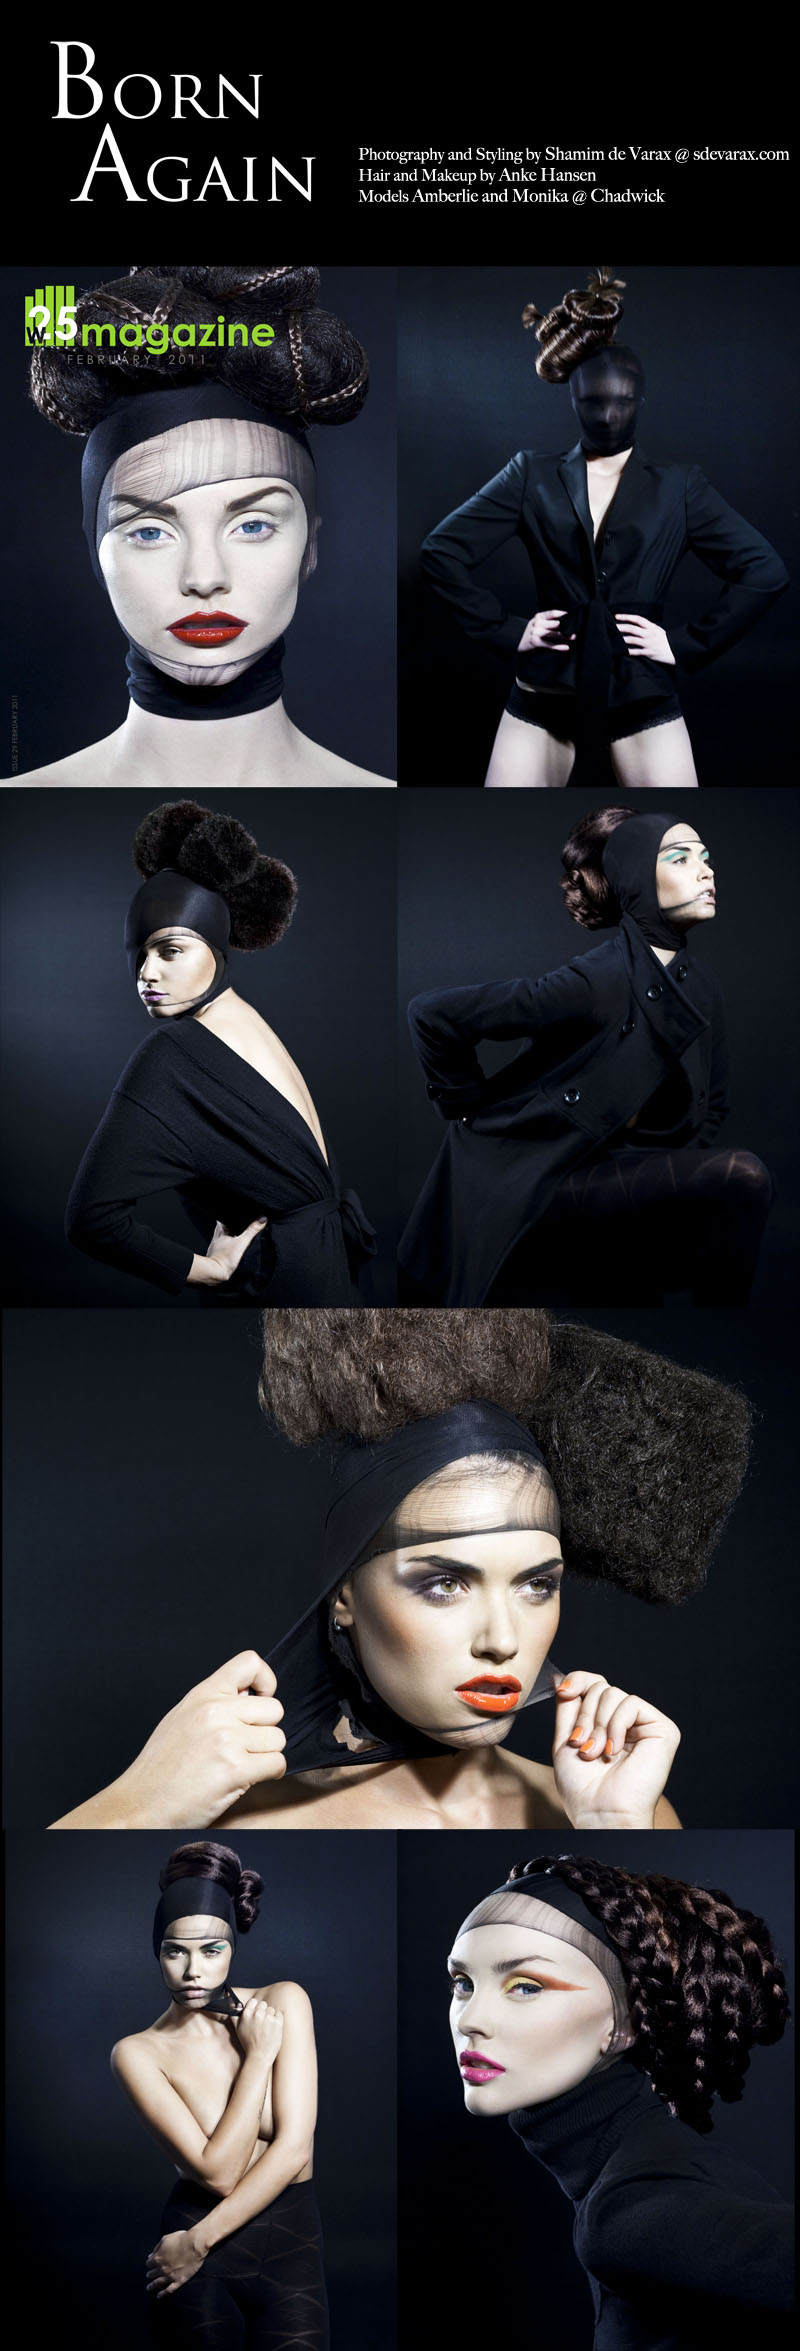 Melbourne May 11, 2011 S de Varax Hair and Makeup Anke Hansen/Styling S de Varax/Models Amberlie and Monika @ Chadwick